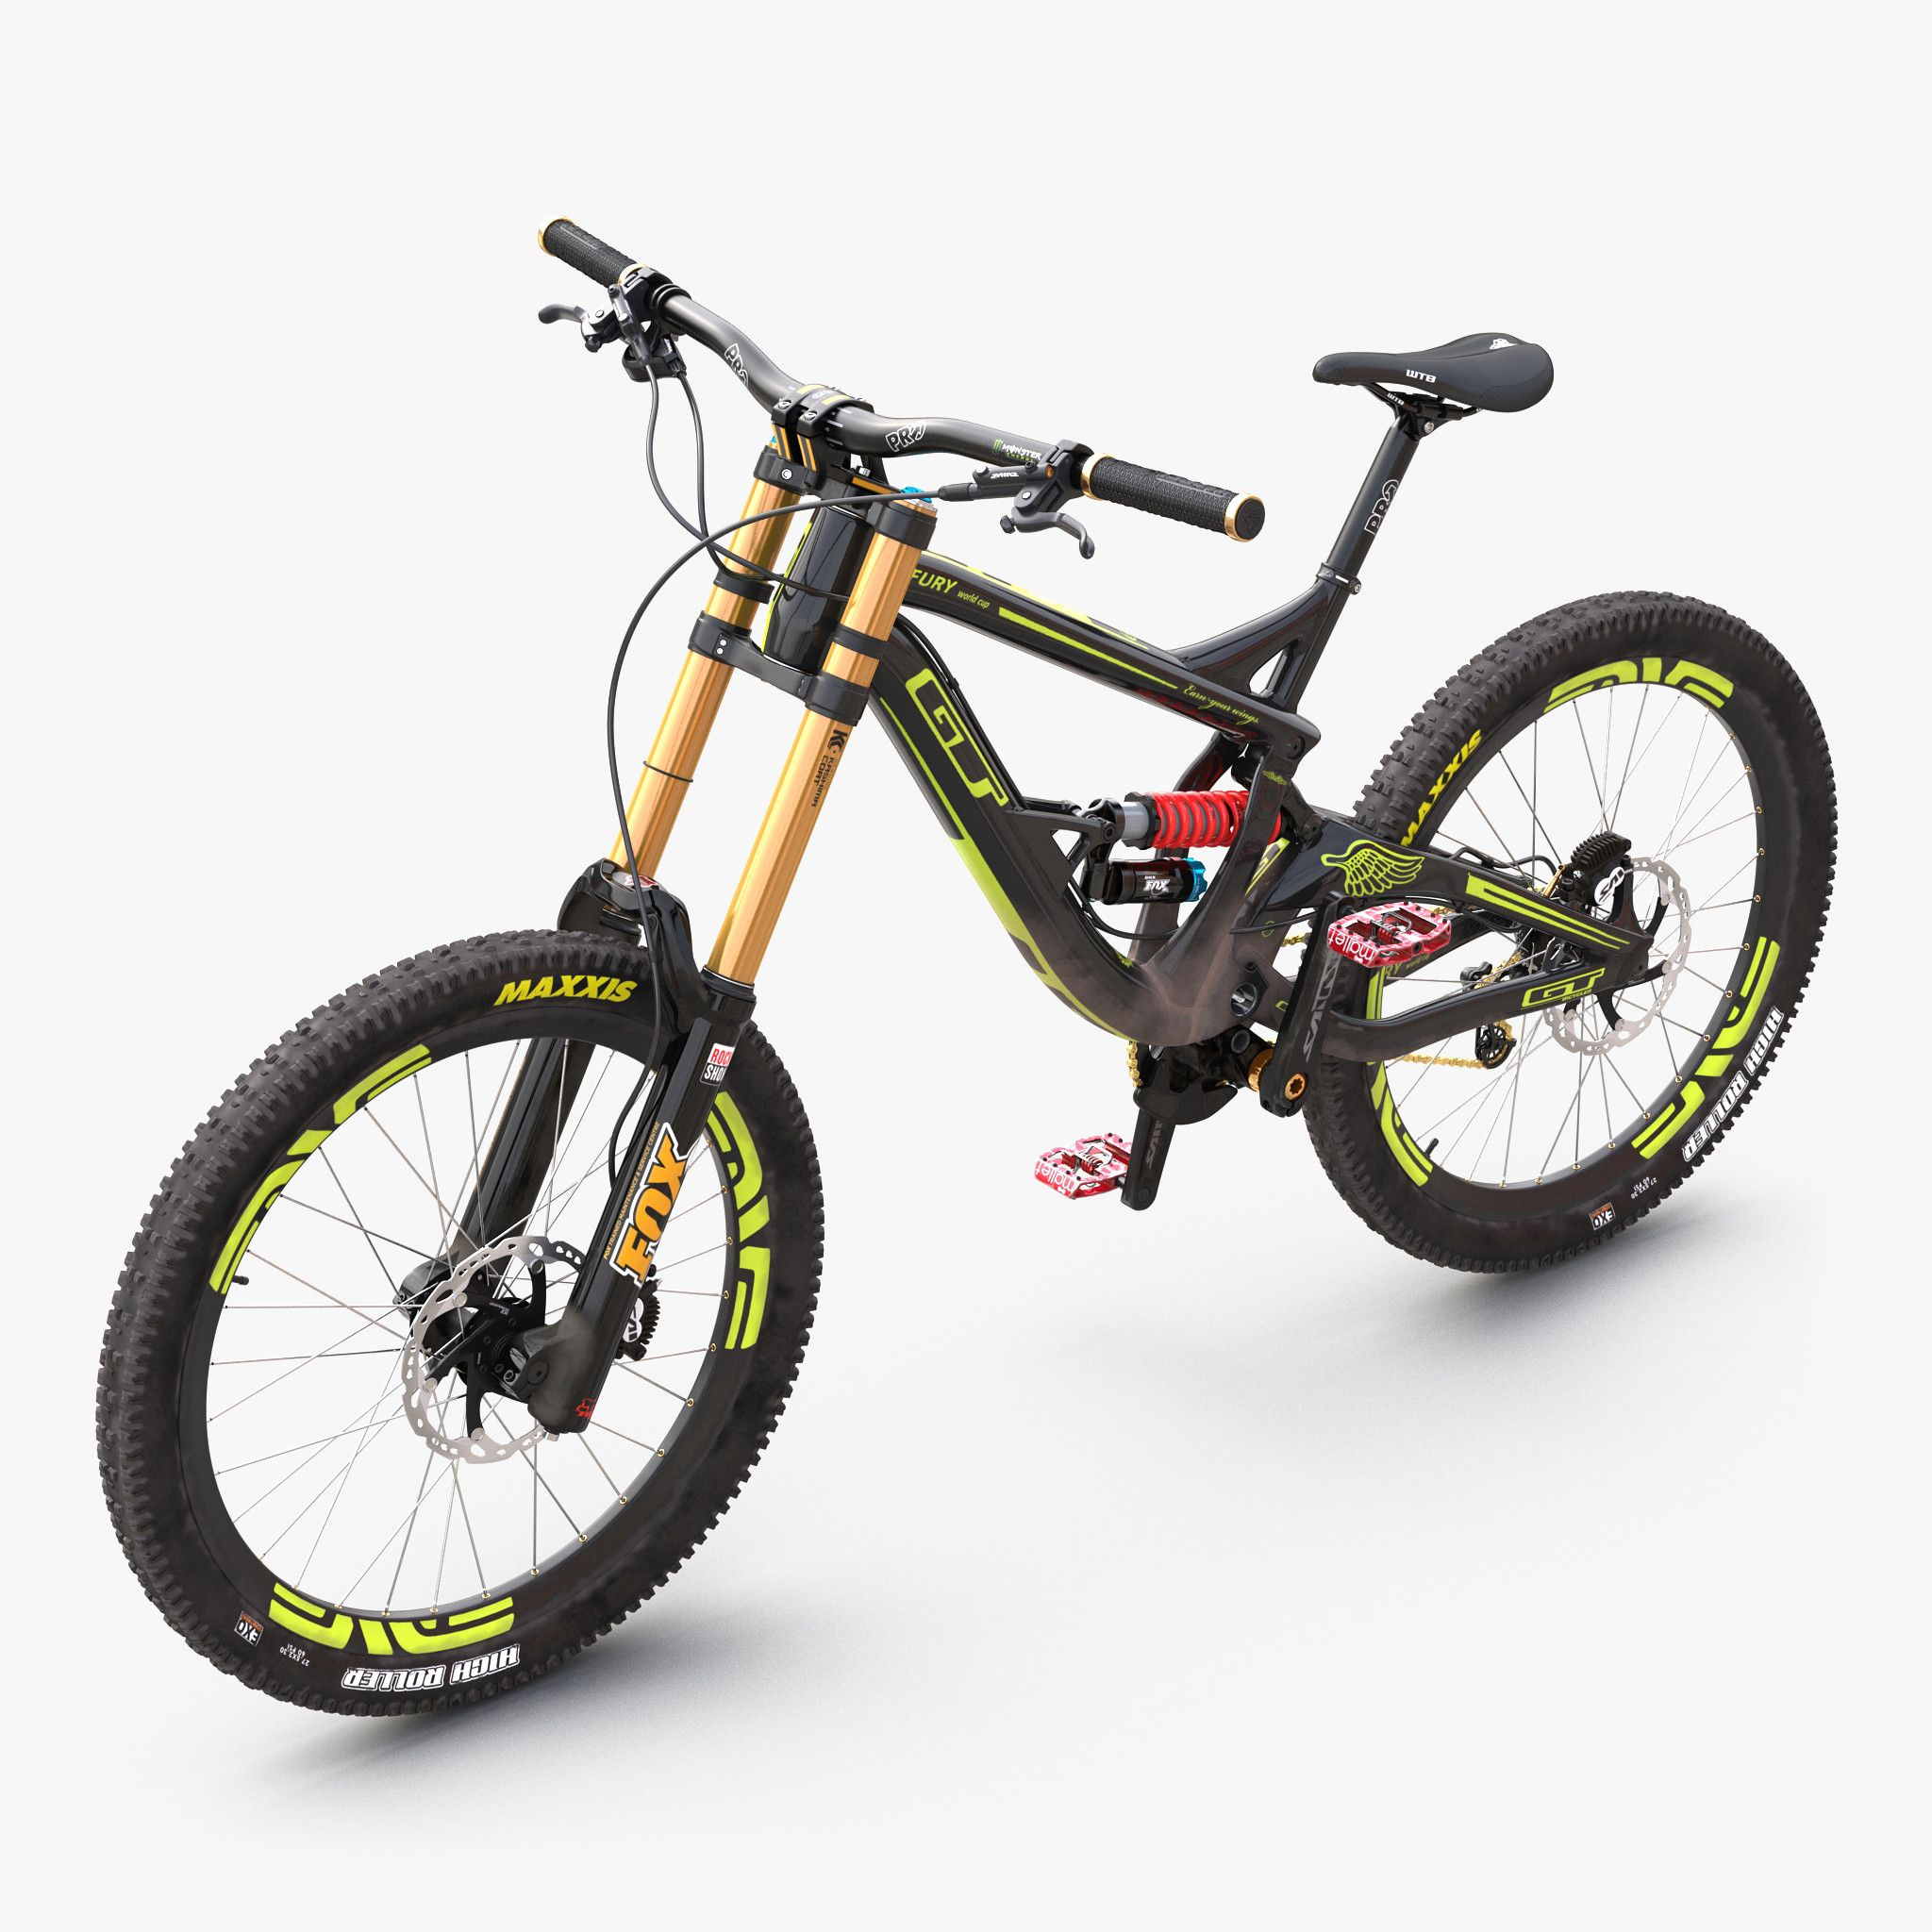 36b531f409e 3d mountain bike gt fury model | Kool Bicyclez | Gt mountain bikes ...